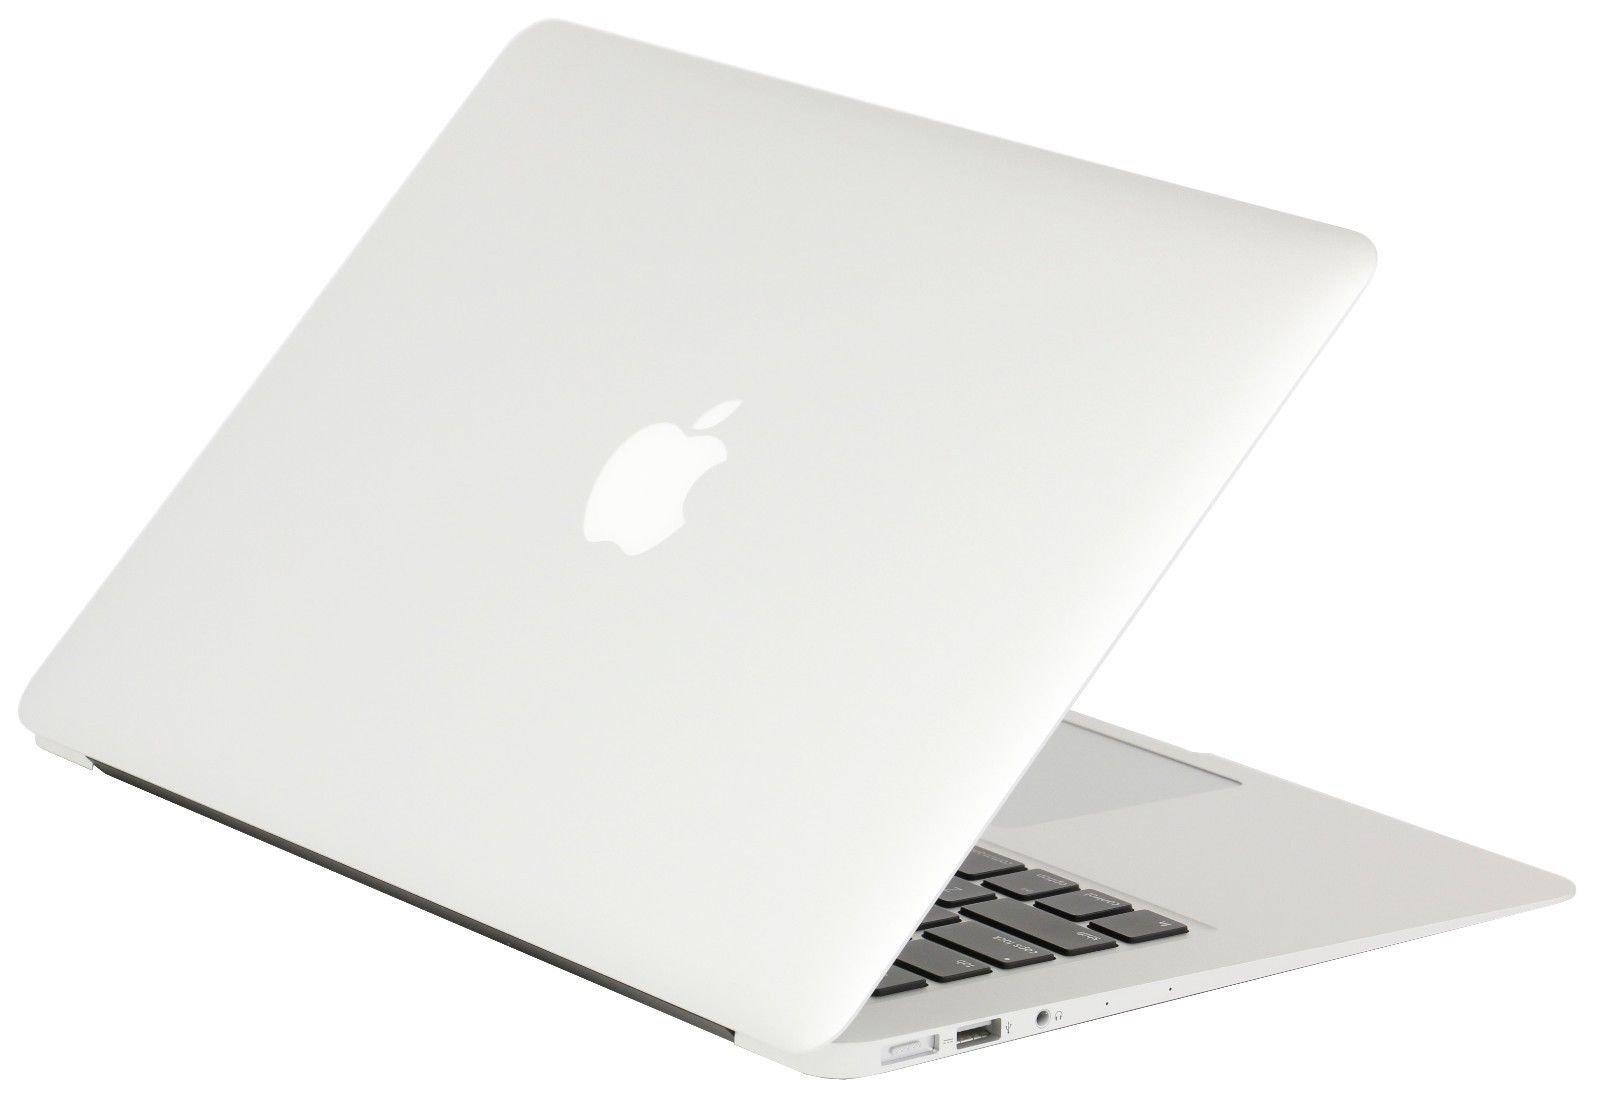 "Apple 13"" MacBook Air, 1.8GHz Intel Core i5 Dual Core Processor, 8GB RAM, 128GB SSD, Mac OS, Silver, MQD32LL/A (Newest Version)"